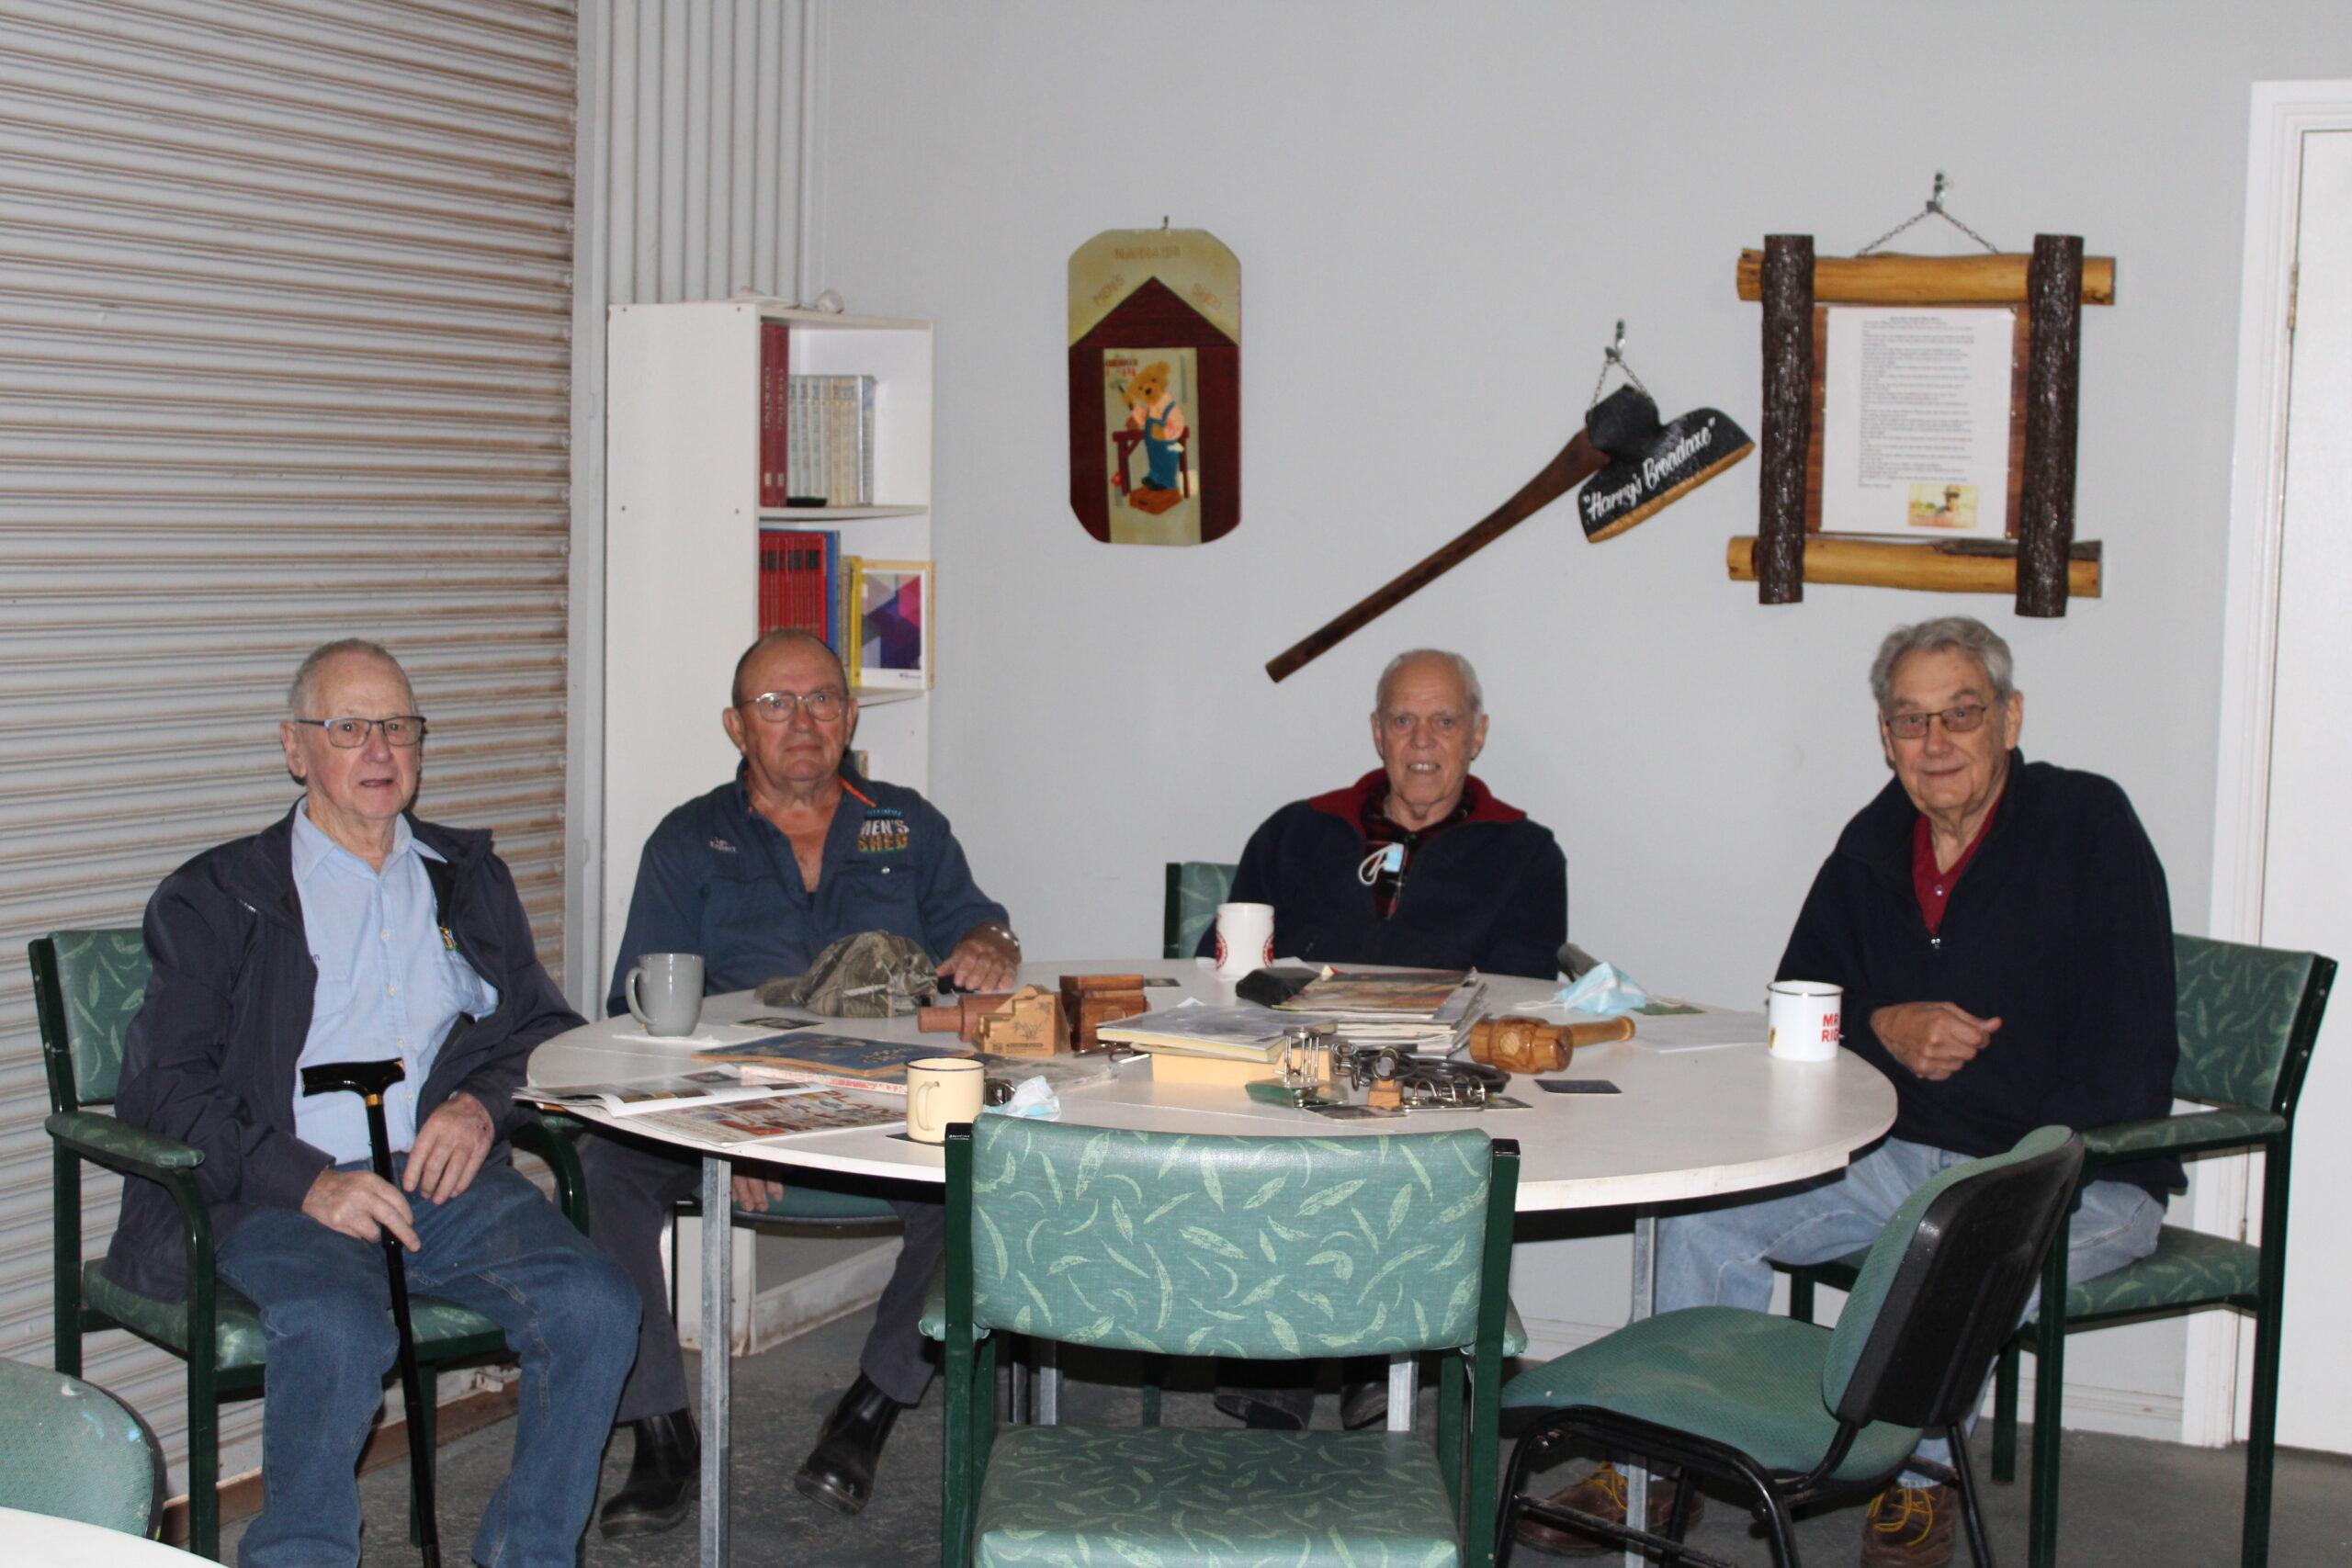 Paul Sorensen, Ian Follett, Barry Smith and Peter Hammond.